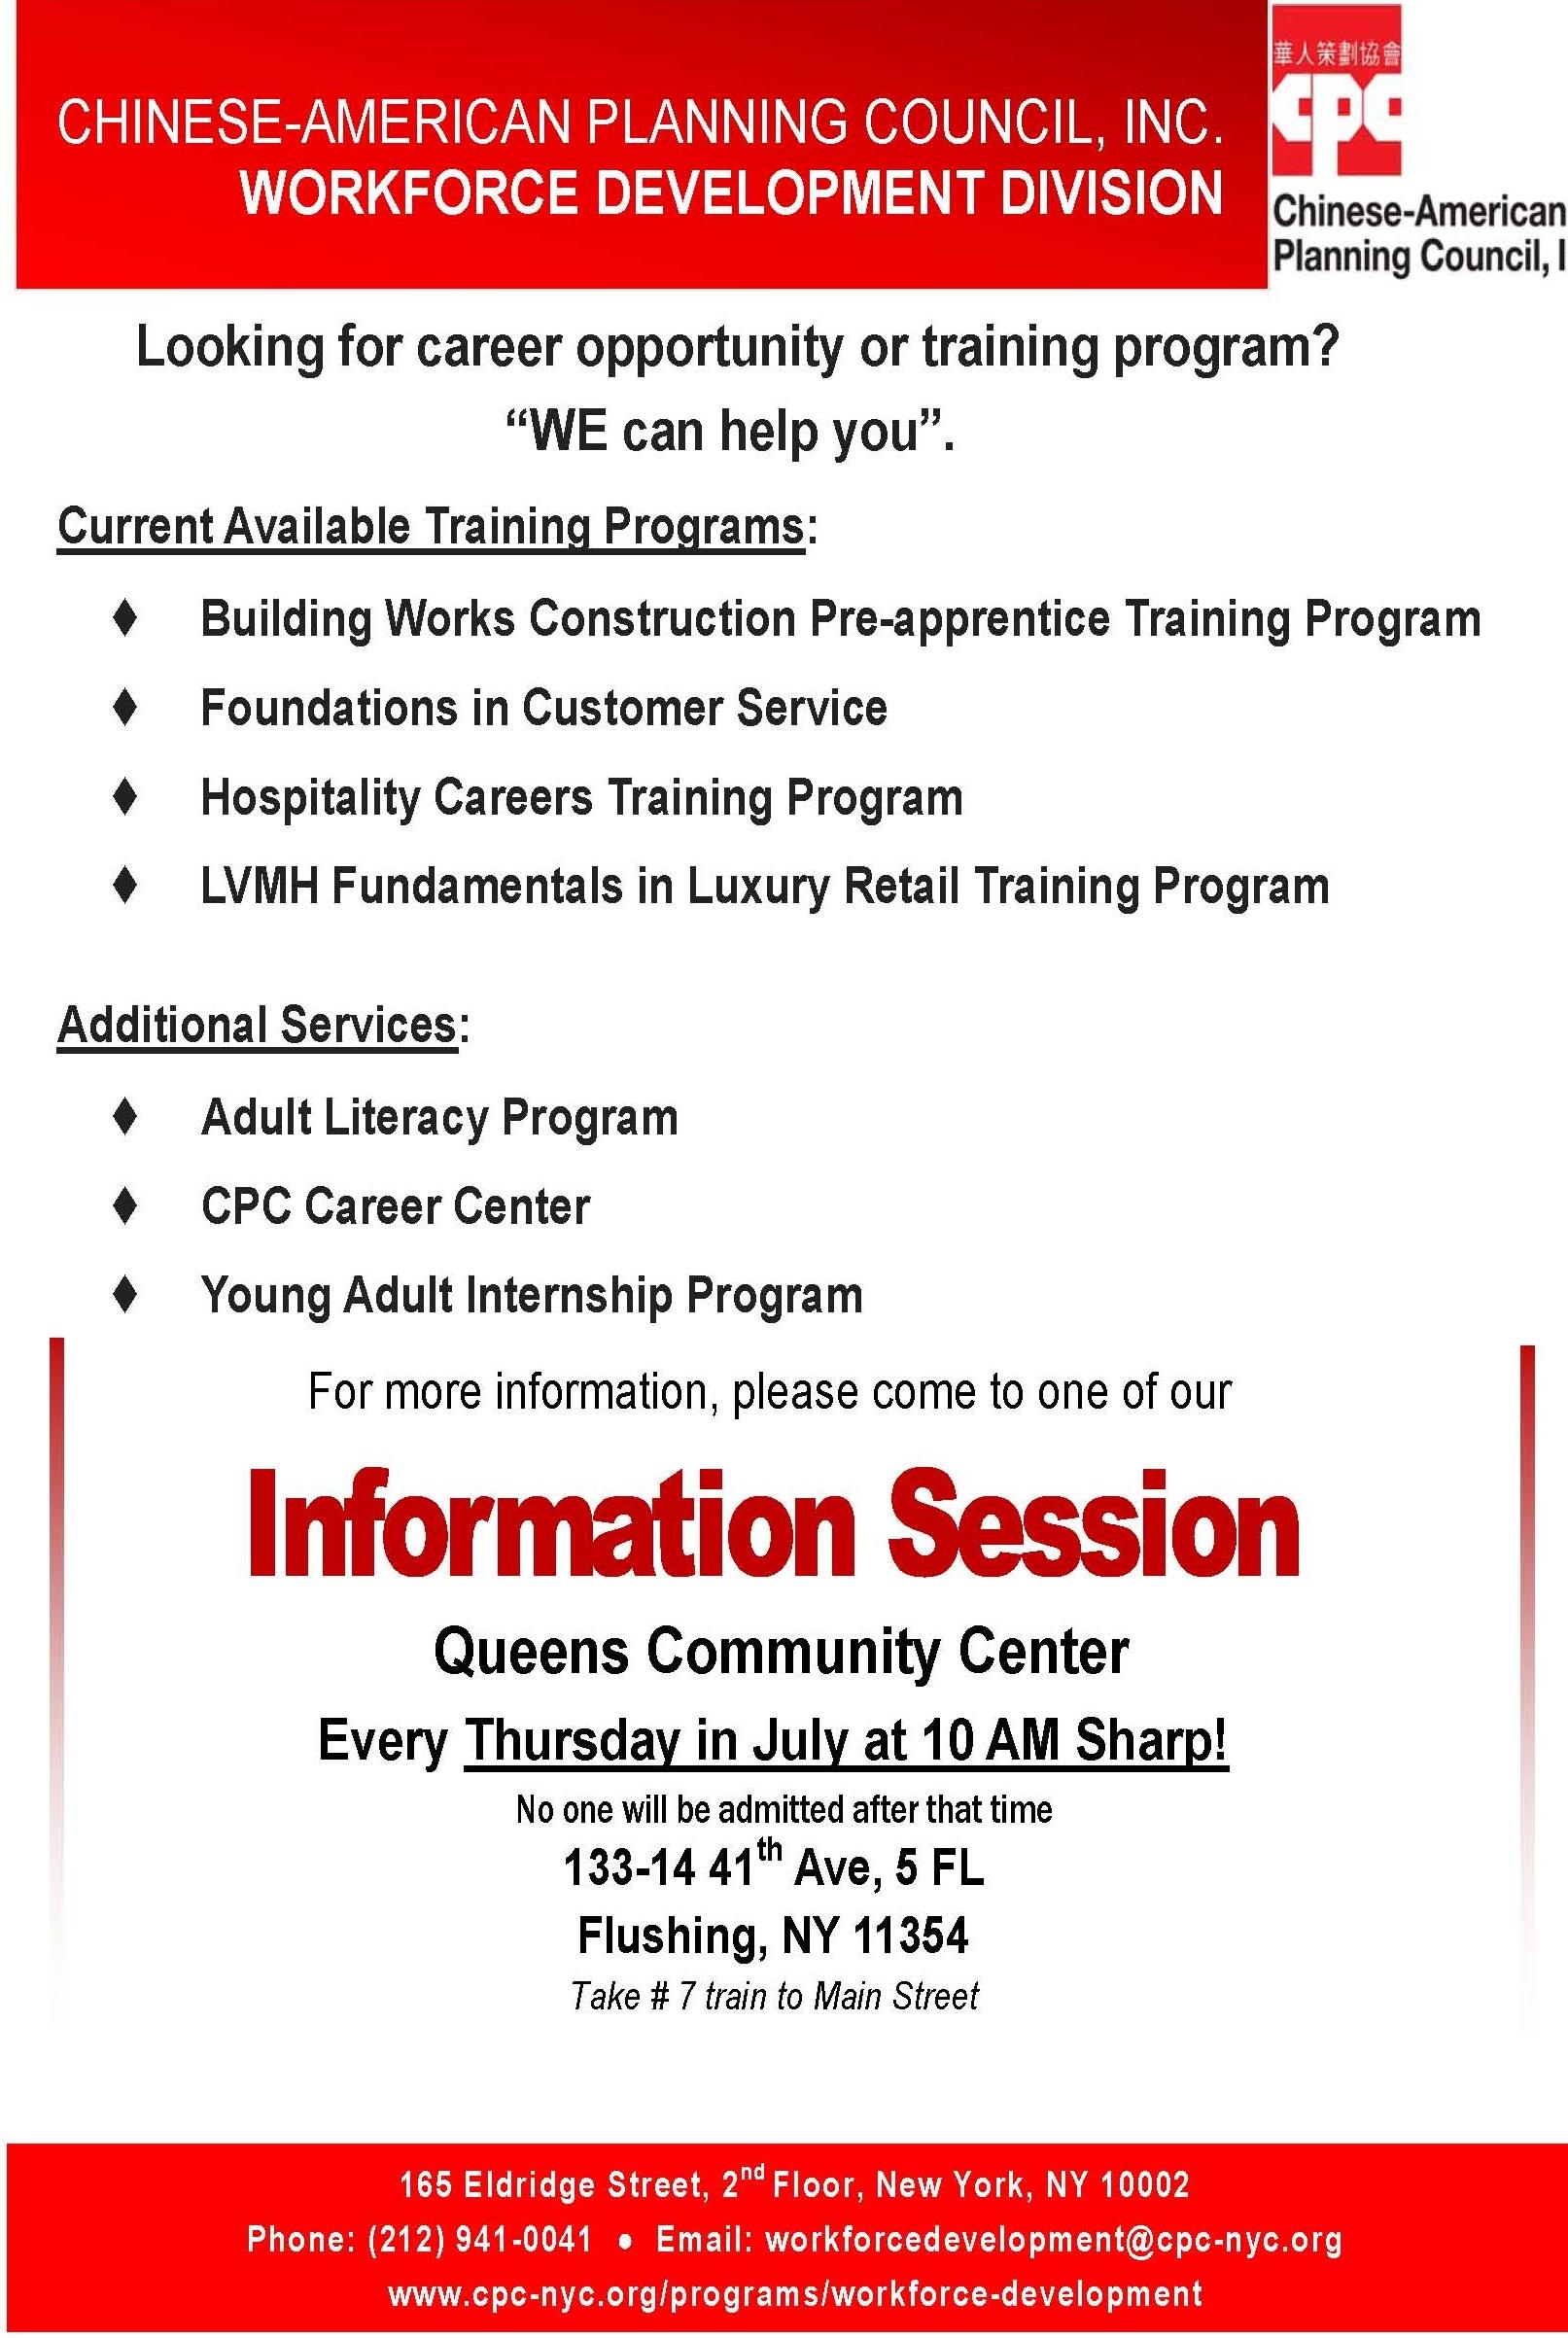 Workforce Development Division Queens Information Session